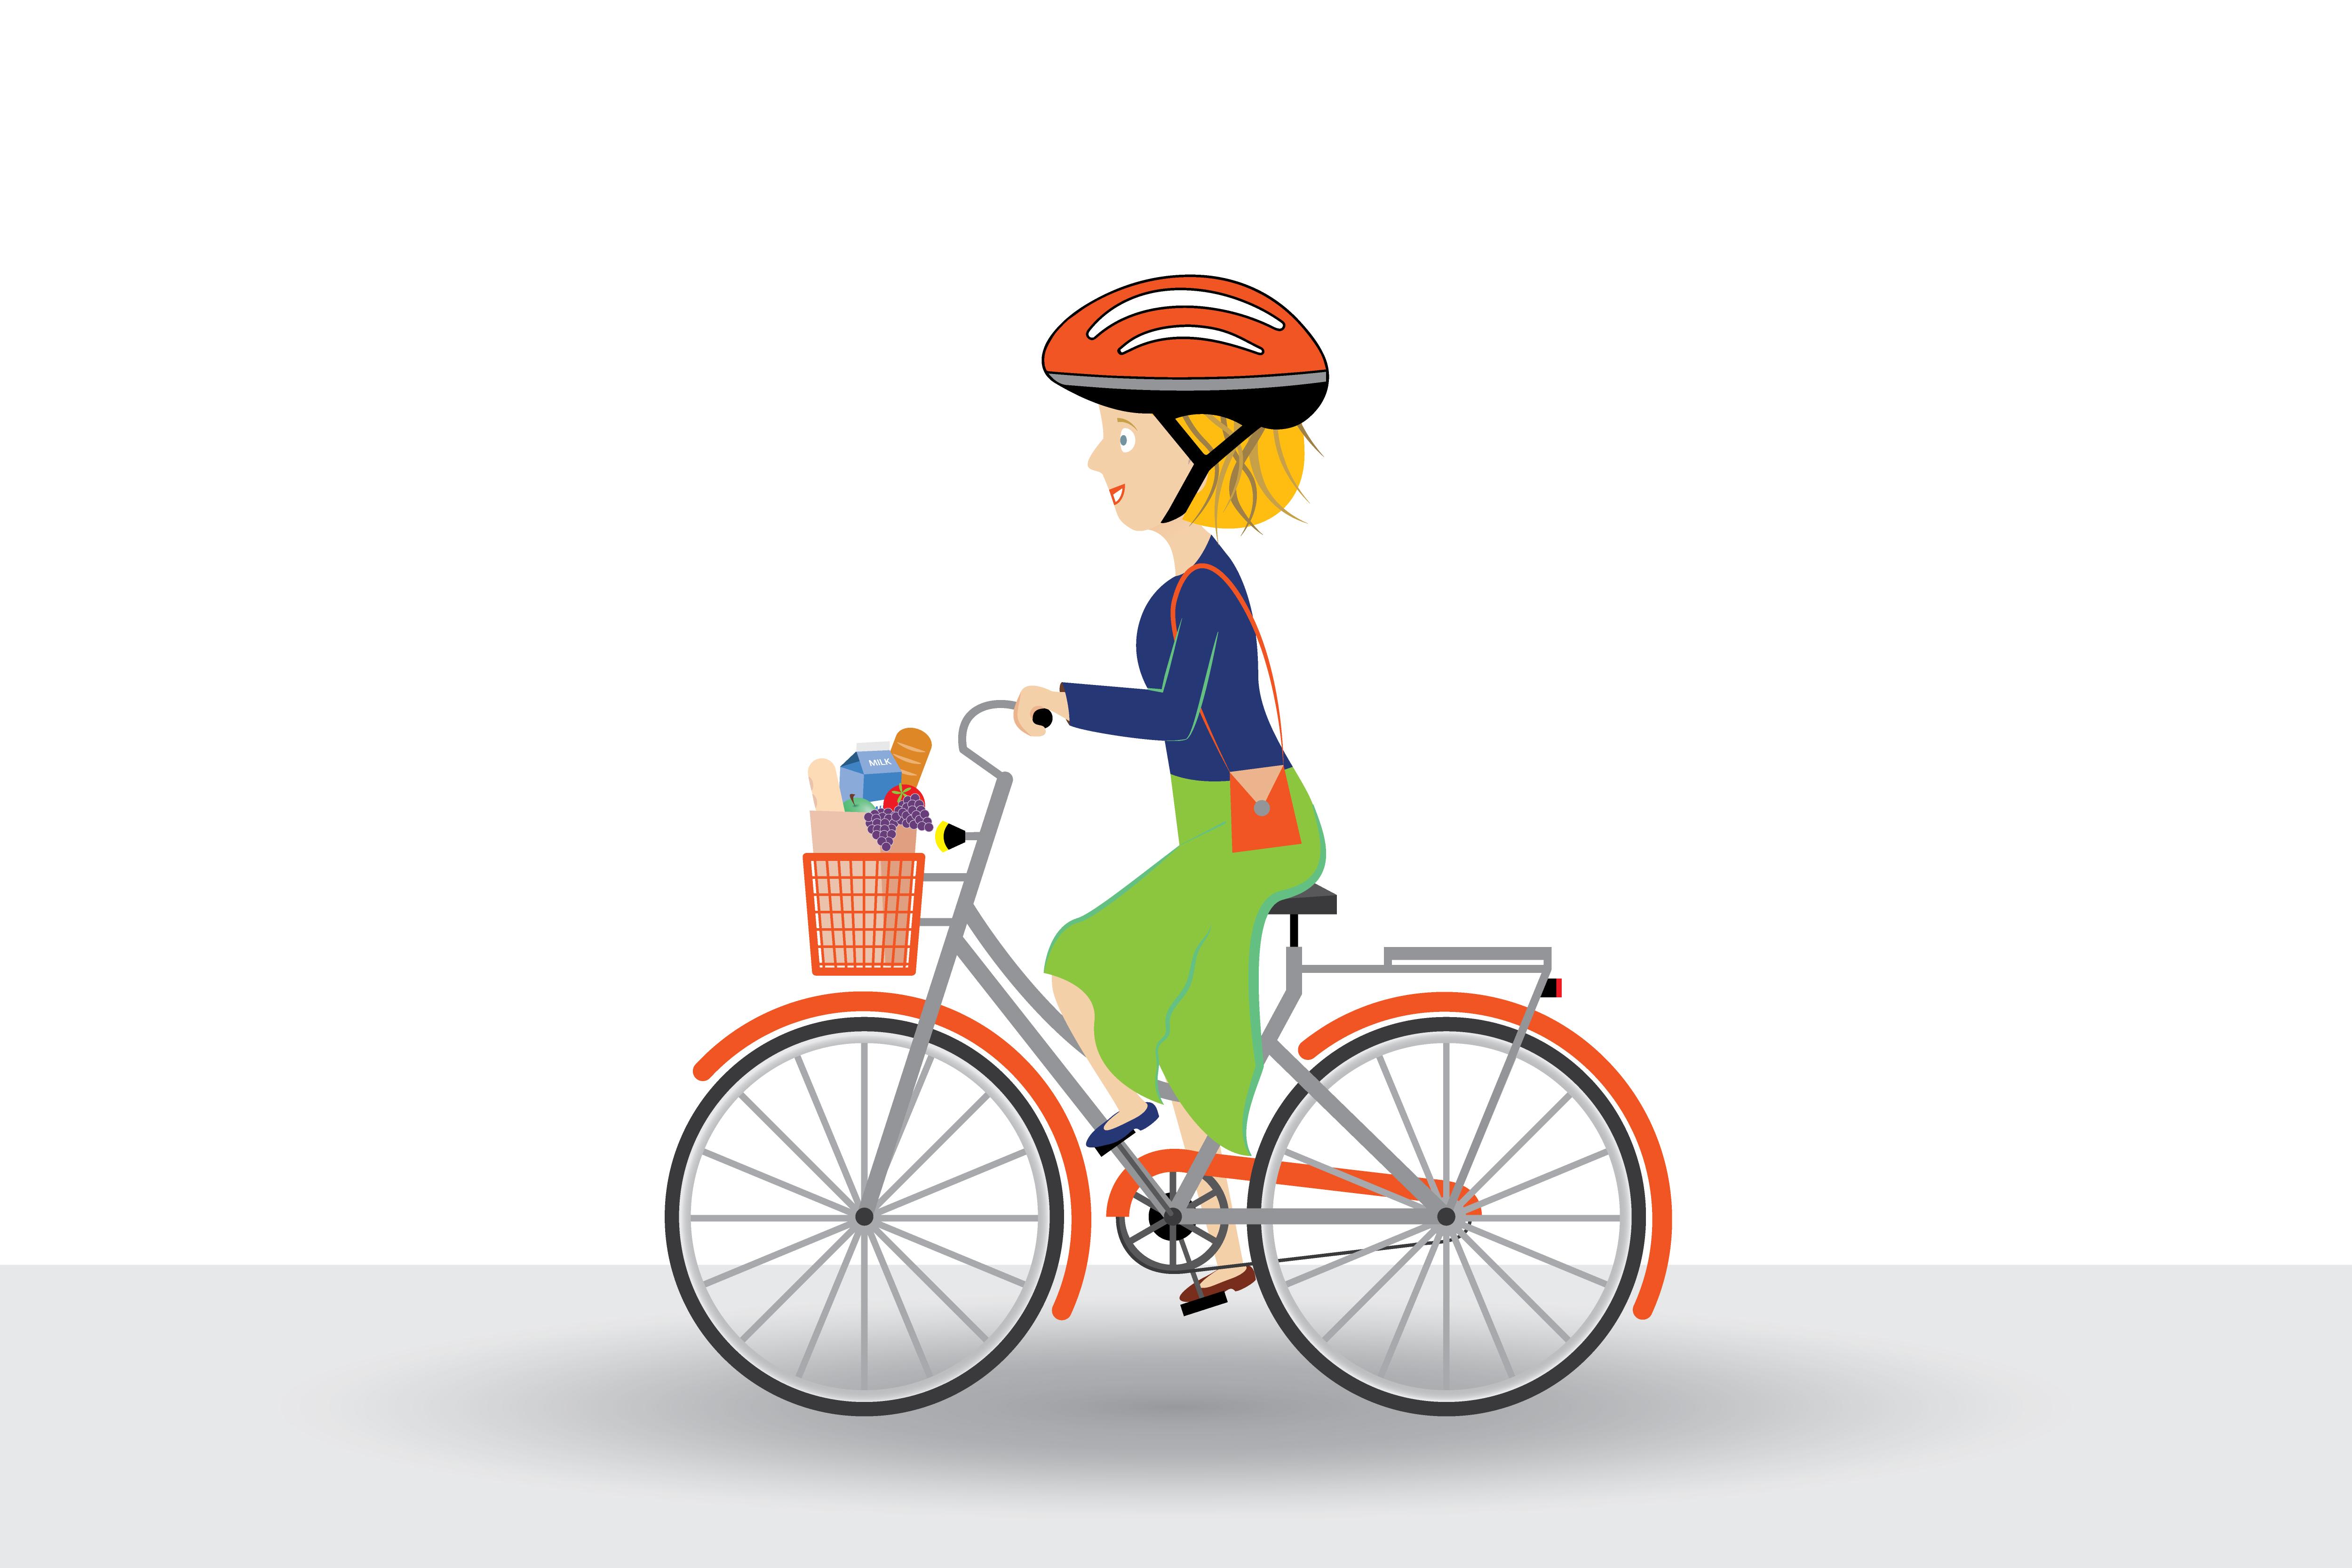 Lady riding her bike